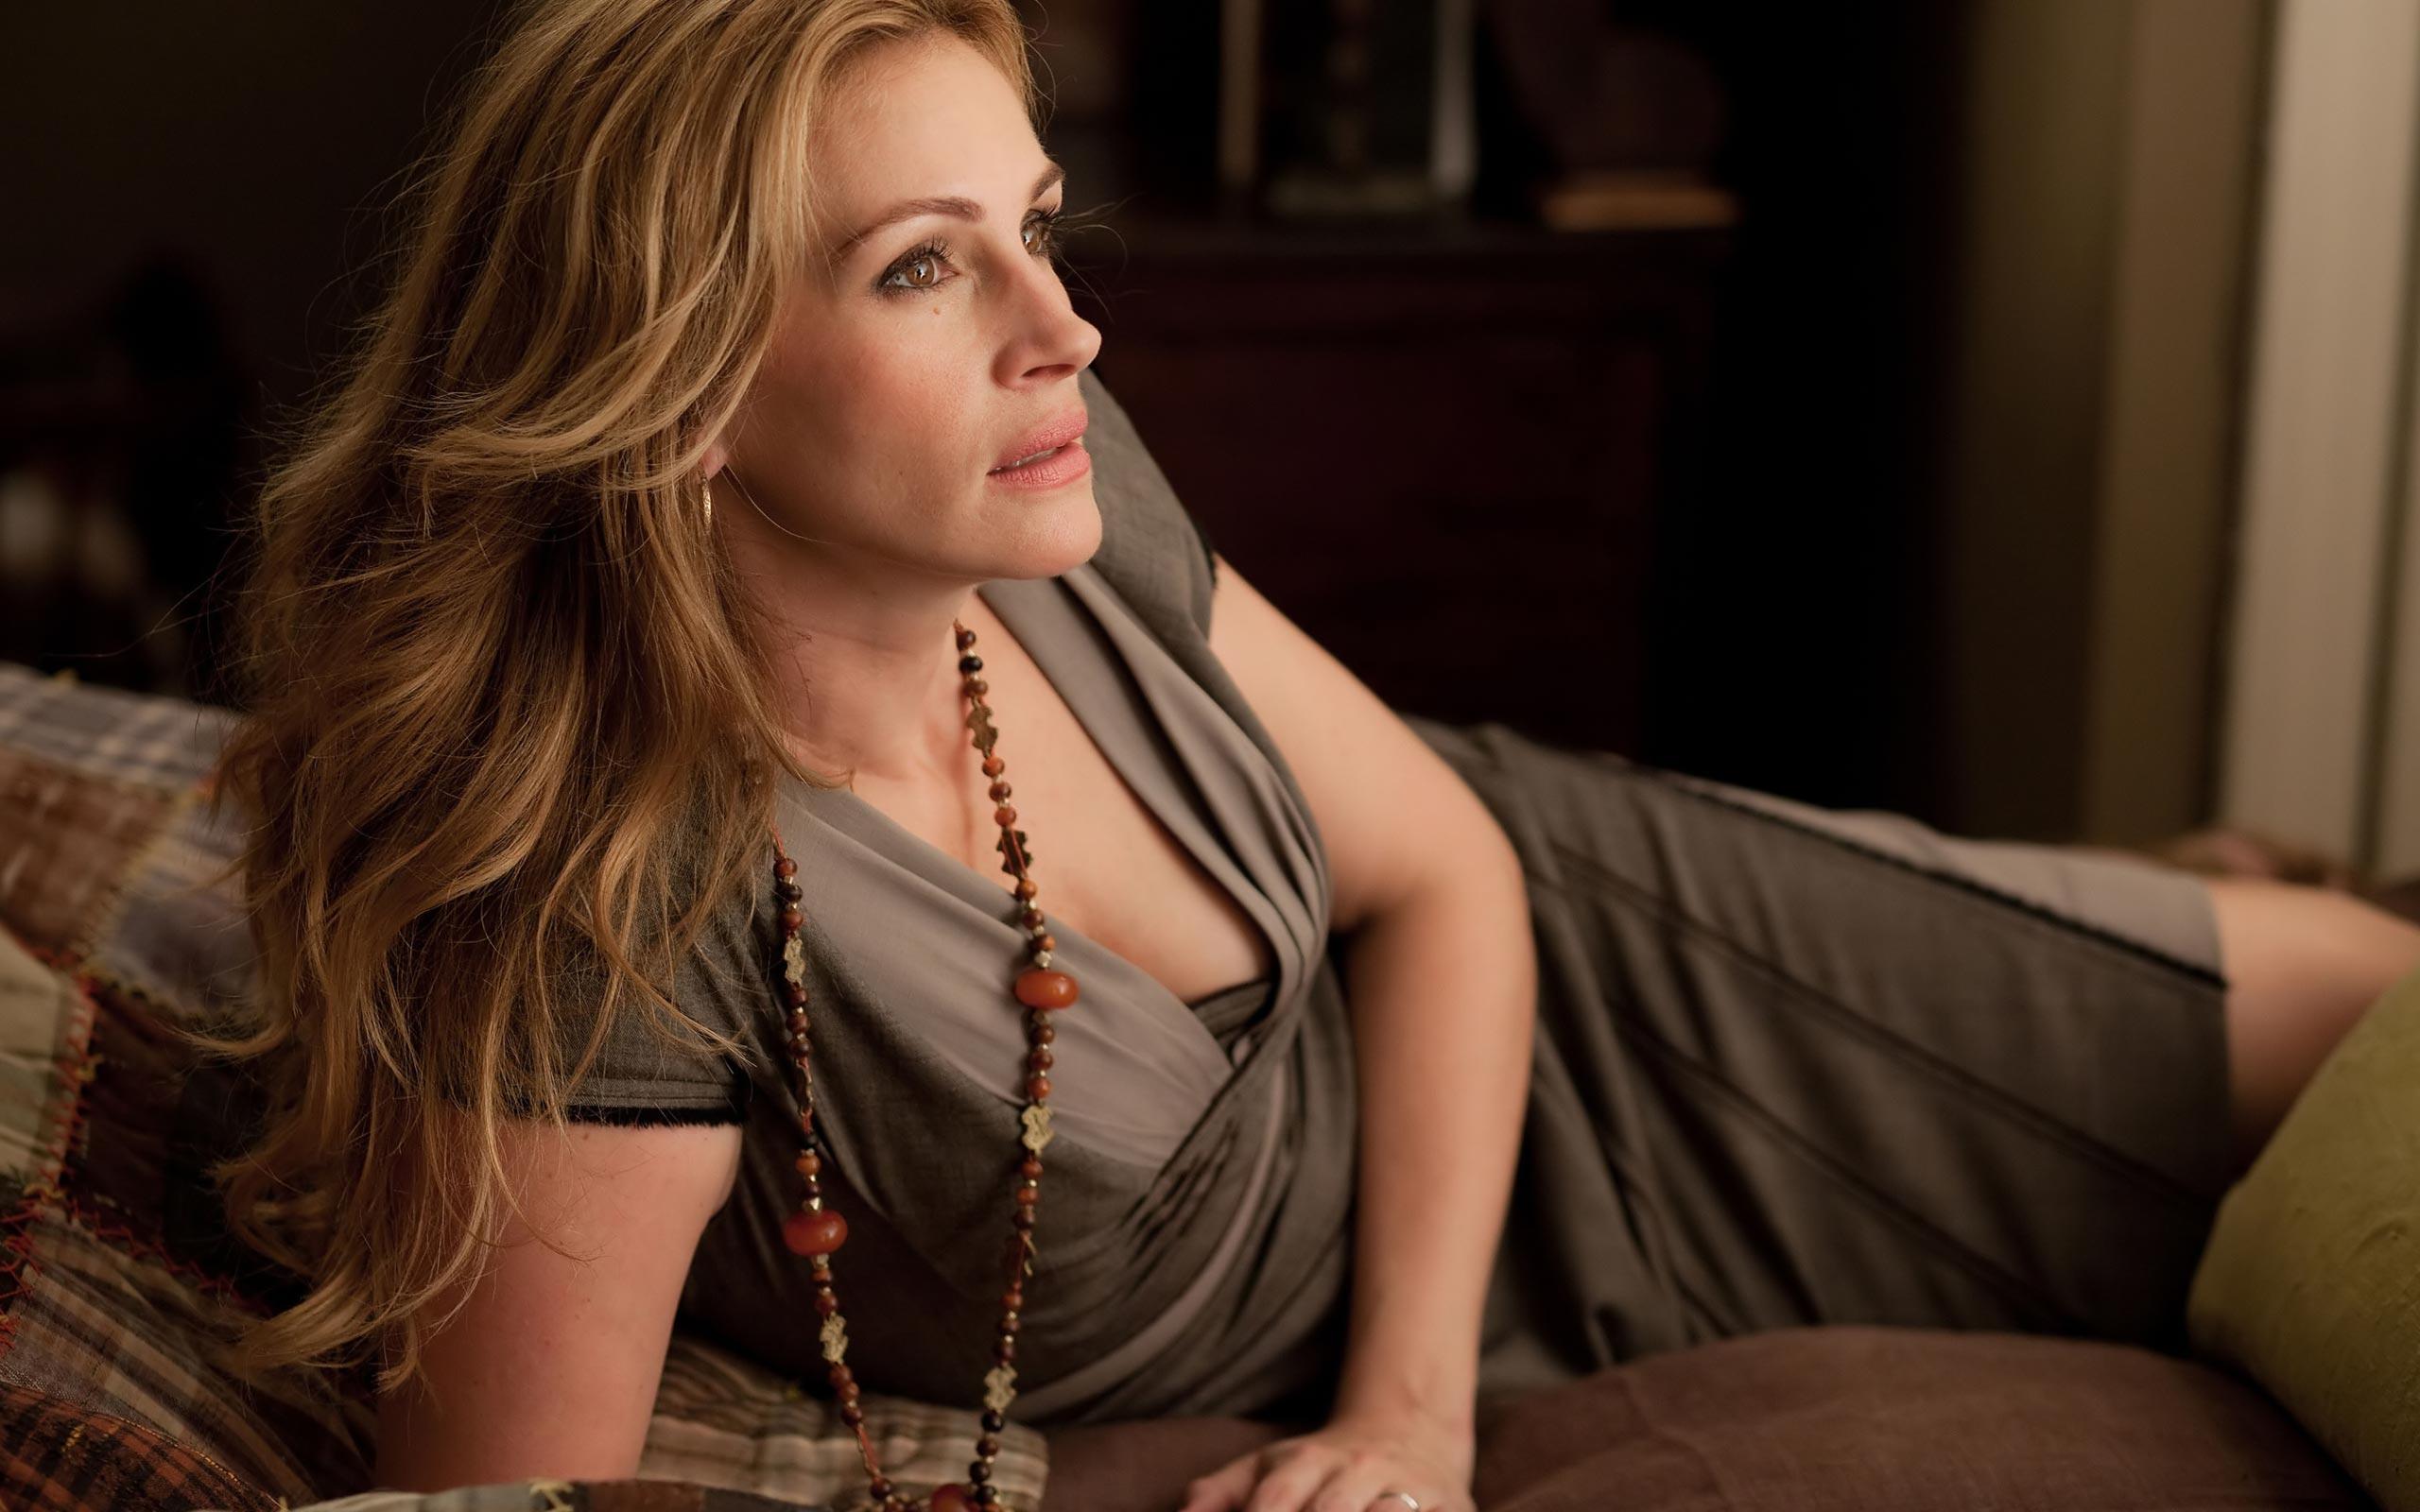 julia roberts celebrity wide hd wallpaper 52547